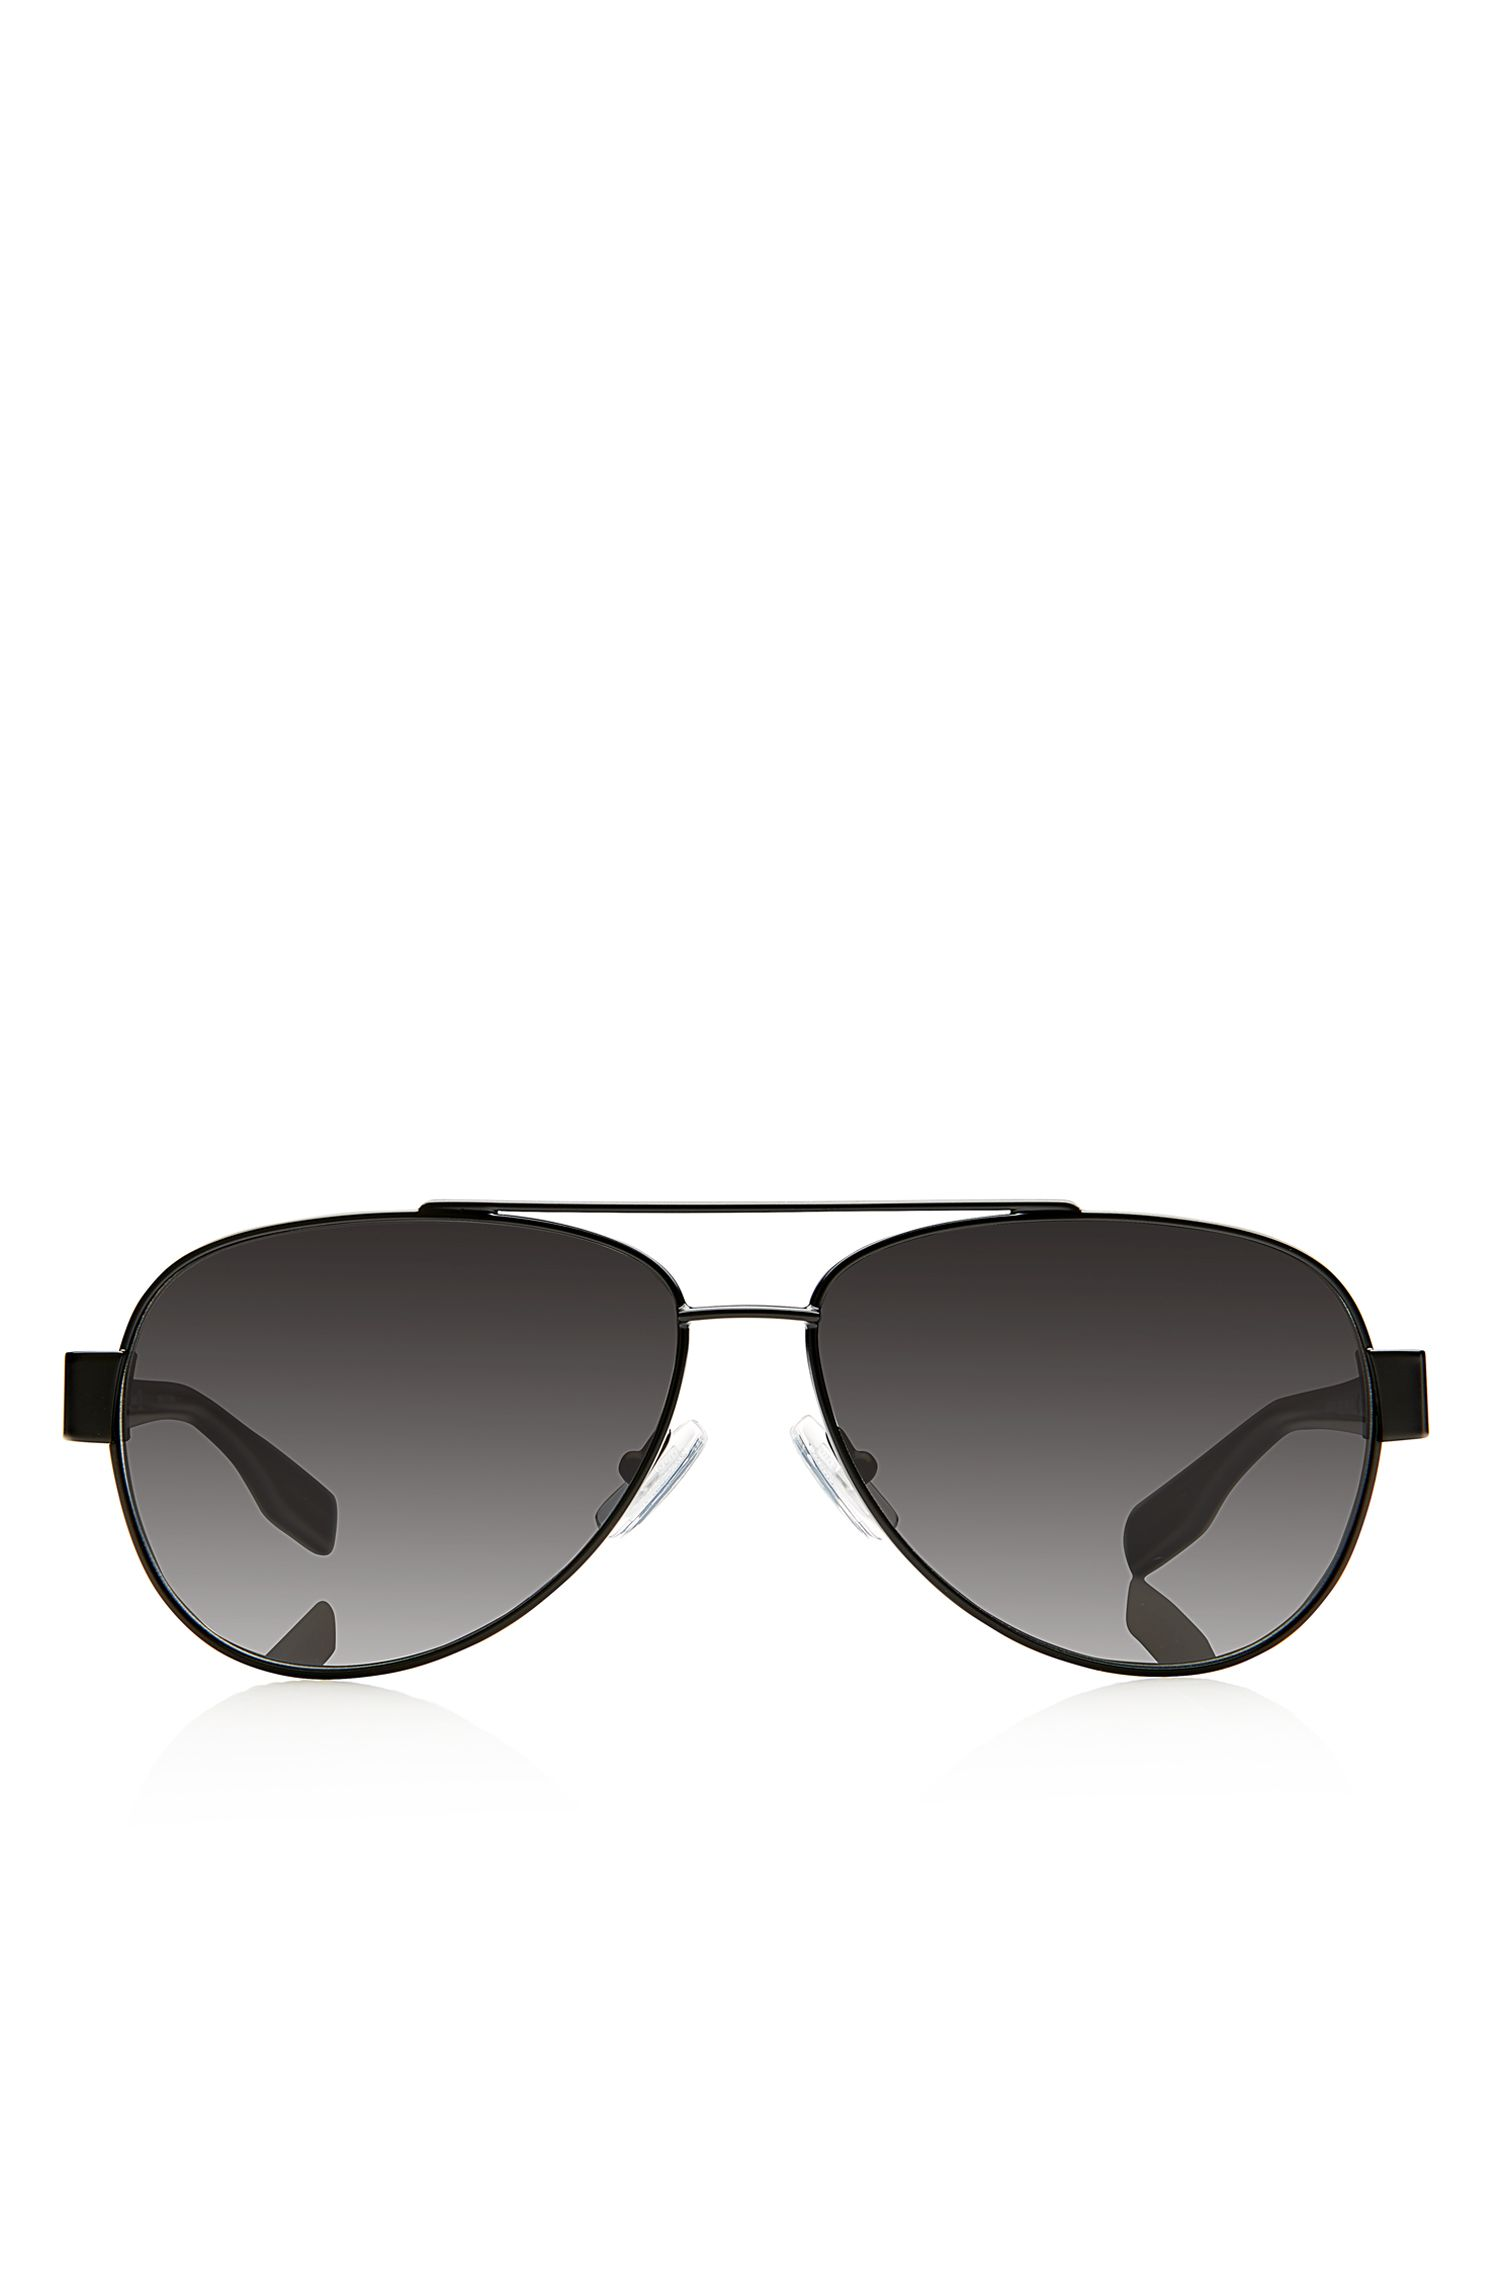 'Sunglasses' | Matte Black Metal Aviator Sunglasses